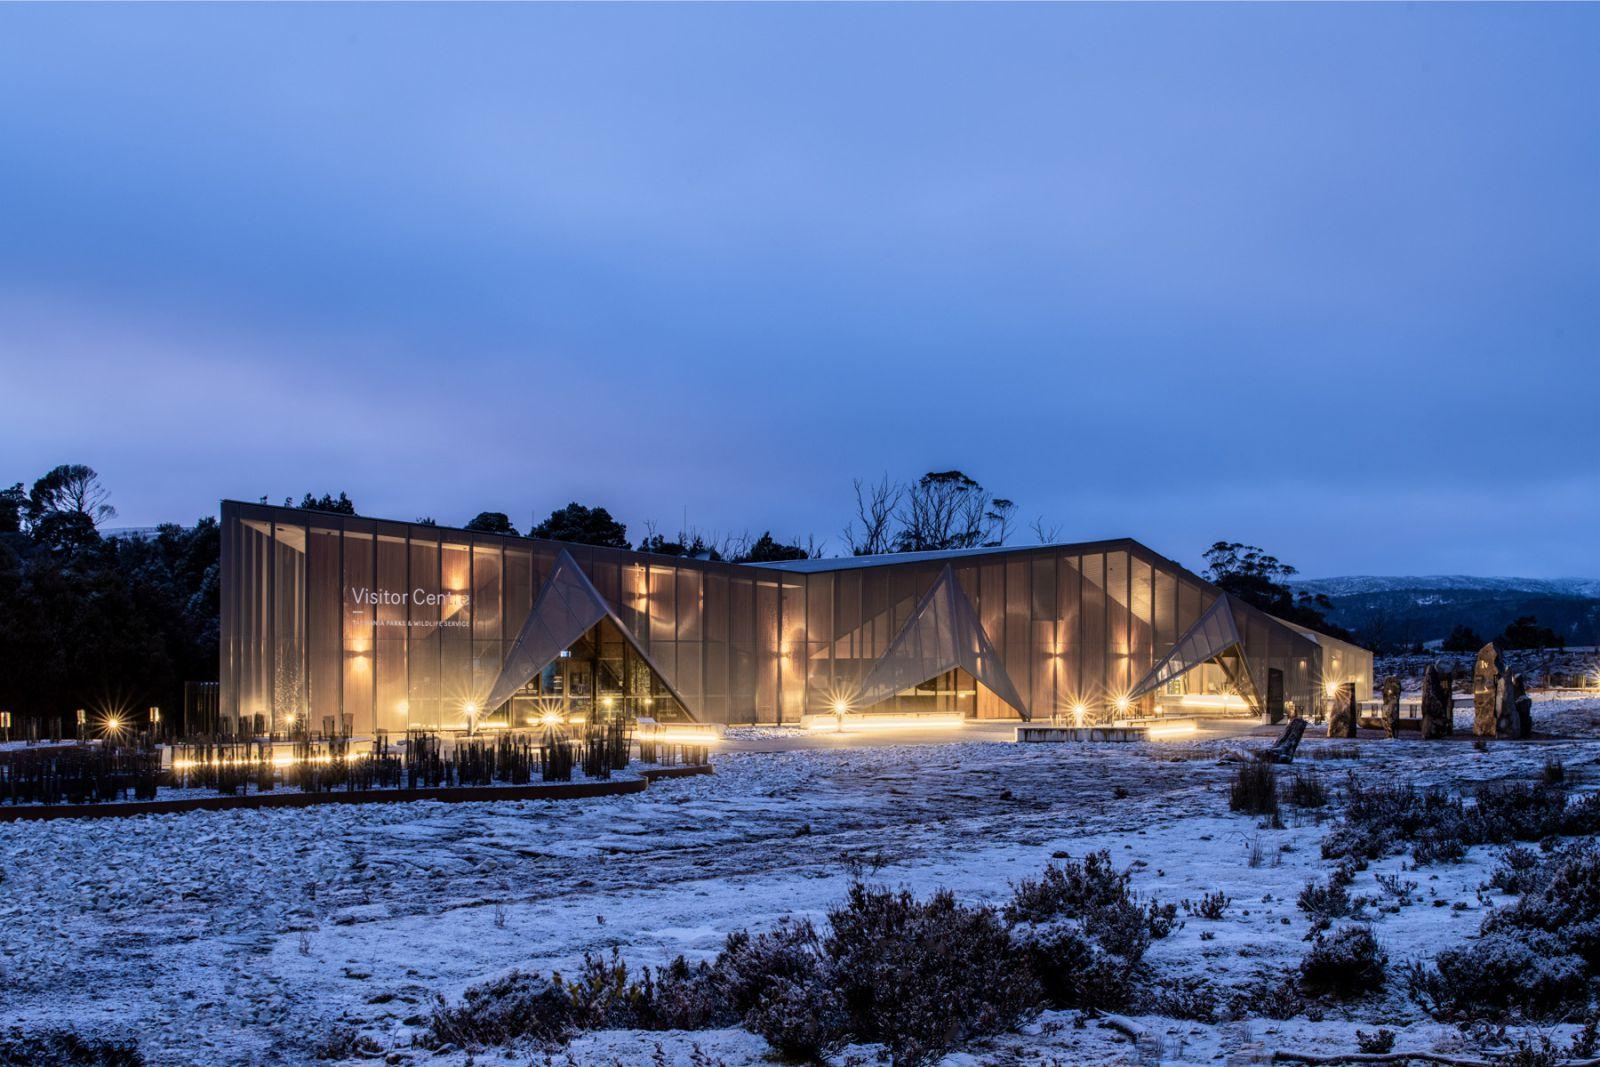 Cradle Mountain Visitor Centre by Cumulus Studio